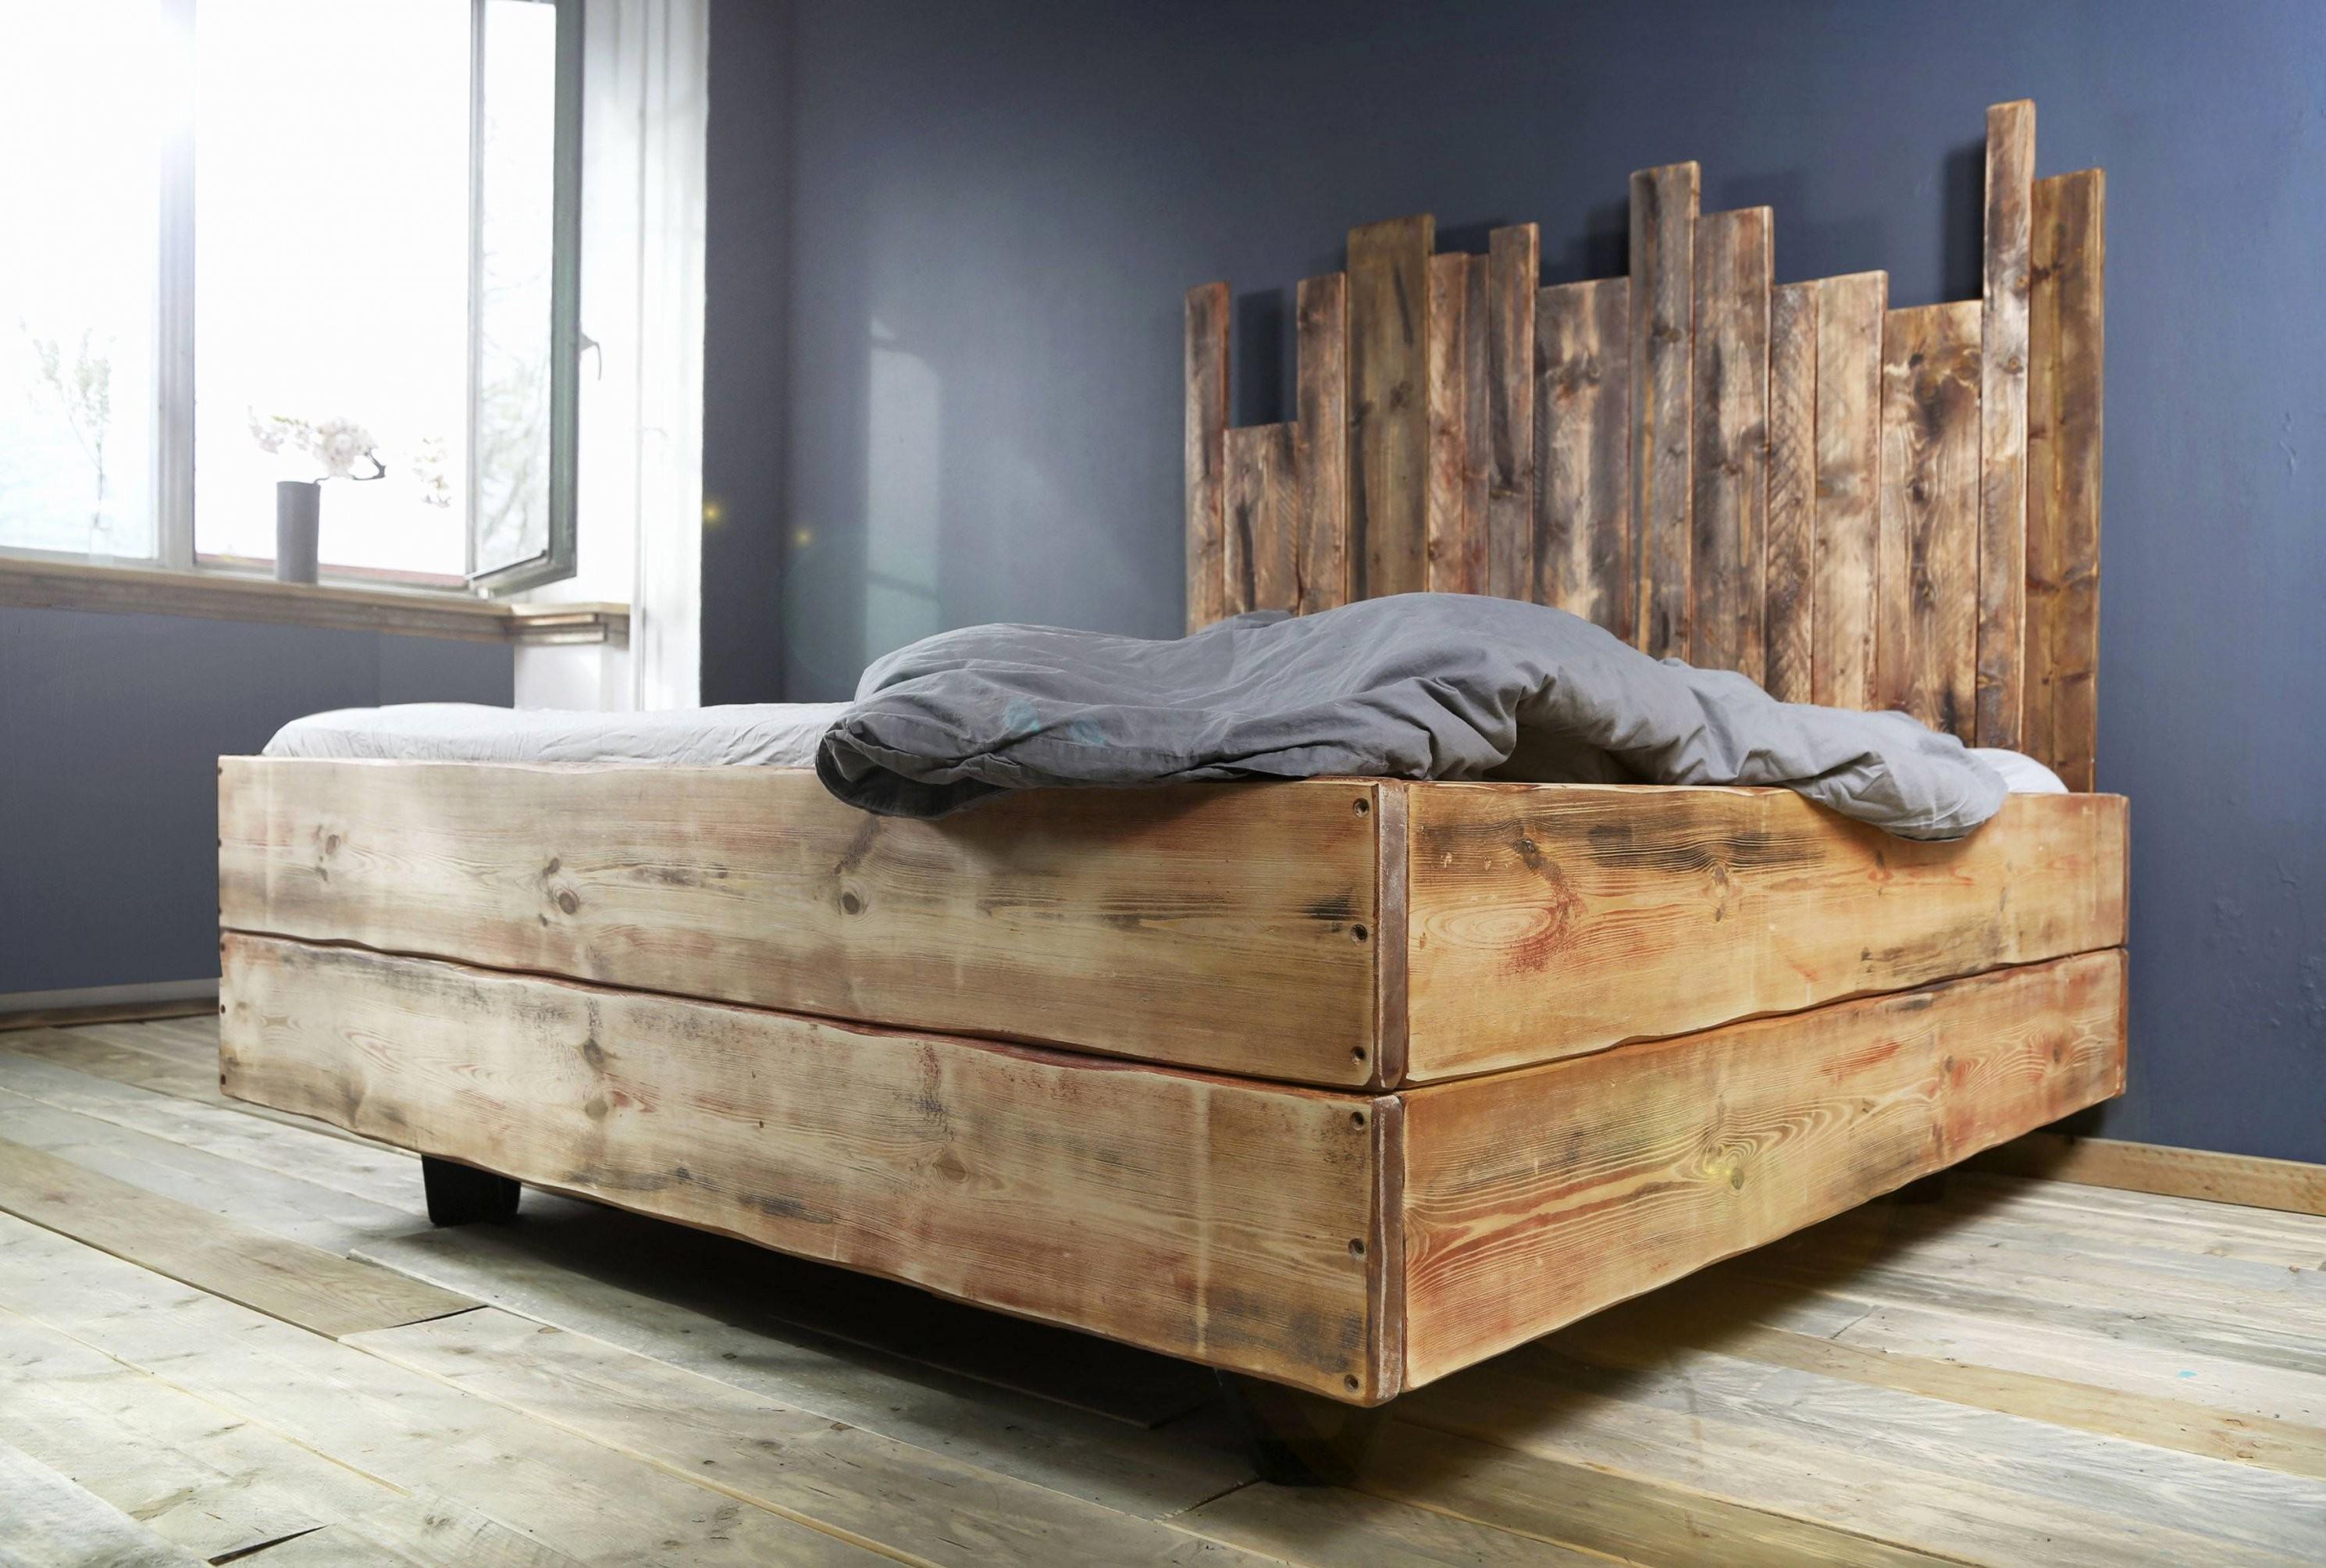 Bett Holz 200×200 Elegant Bett 200×200 Weiß Holz Neu Schwebendes von Bett Holz 200X200 Photo